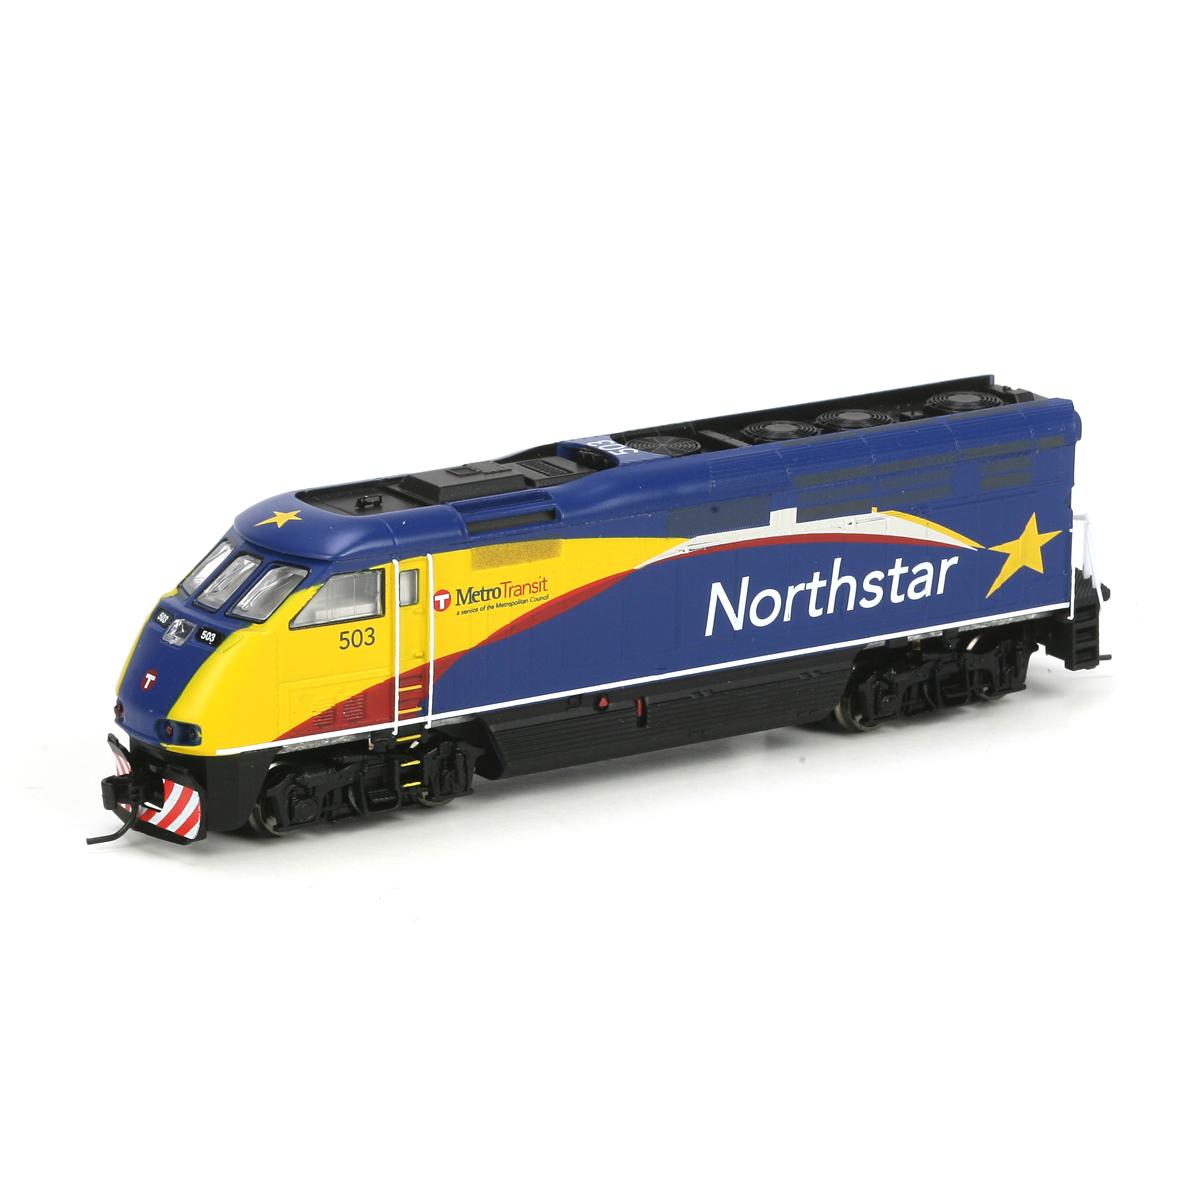 N Scale - Athearn - 23705 - Locomotive, Diesel, EMD F59PHi - Northstar Commuter - 503